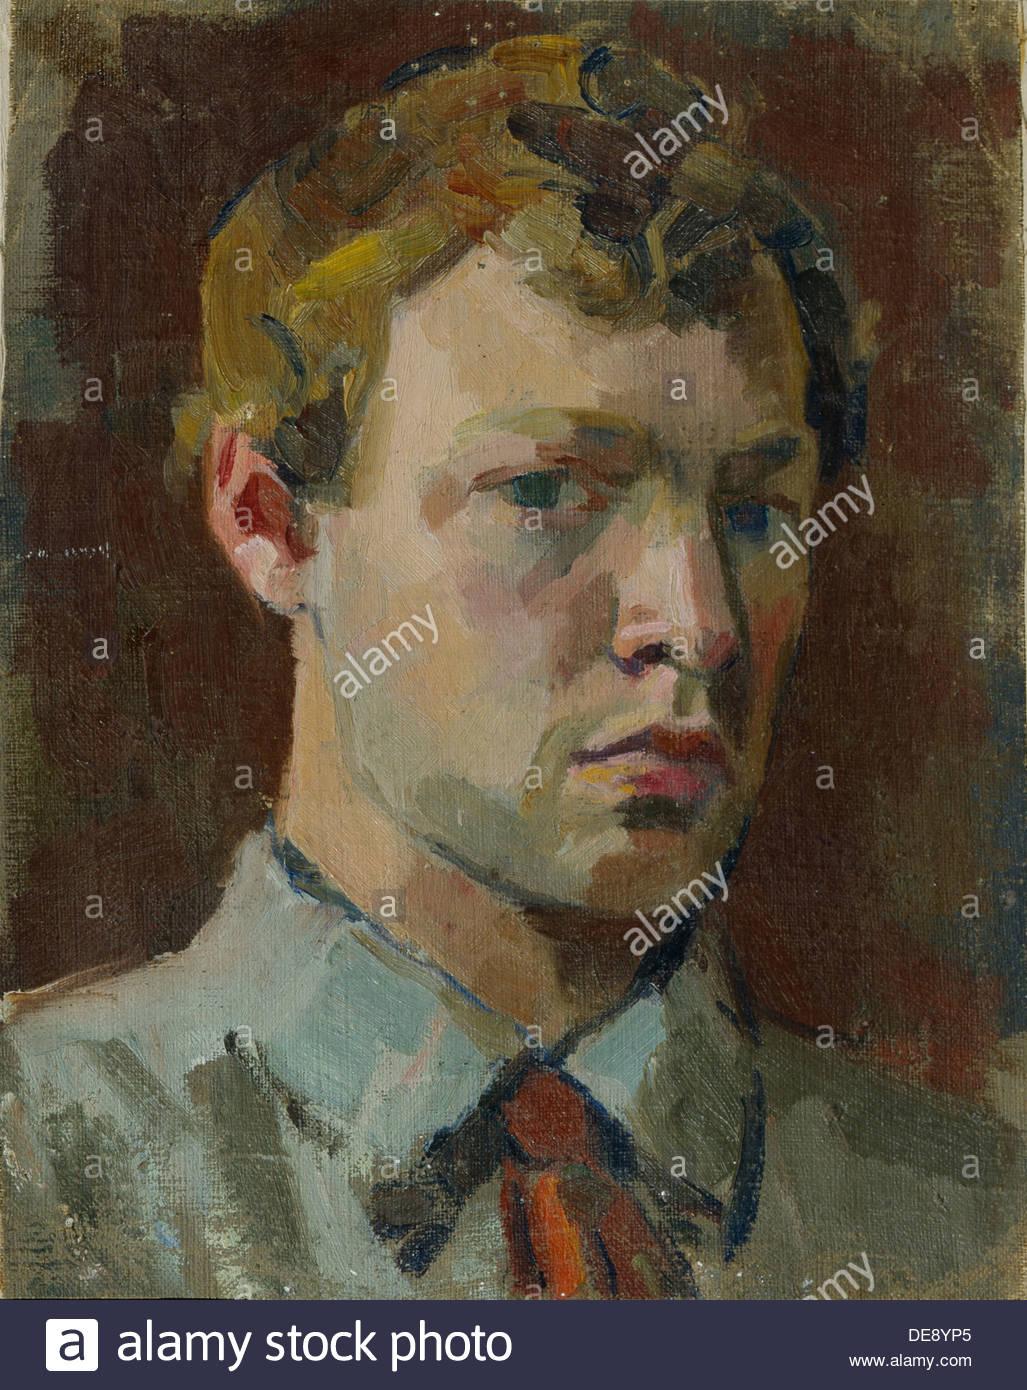 Self-Portrait, 1920s. Artist: Luppov, Sergei Mikhaylovich (1893-1977) - Stock Image